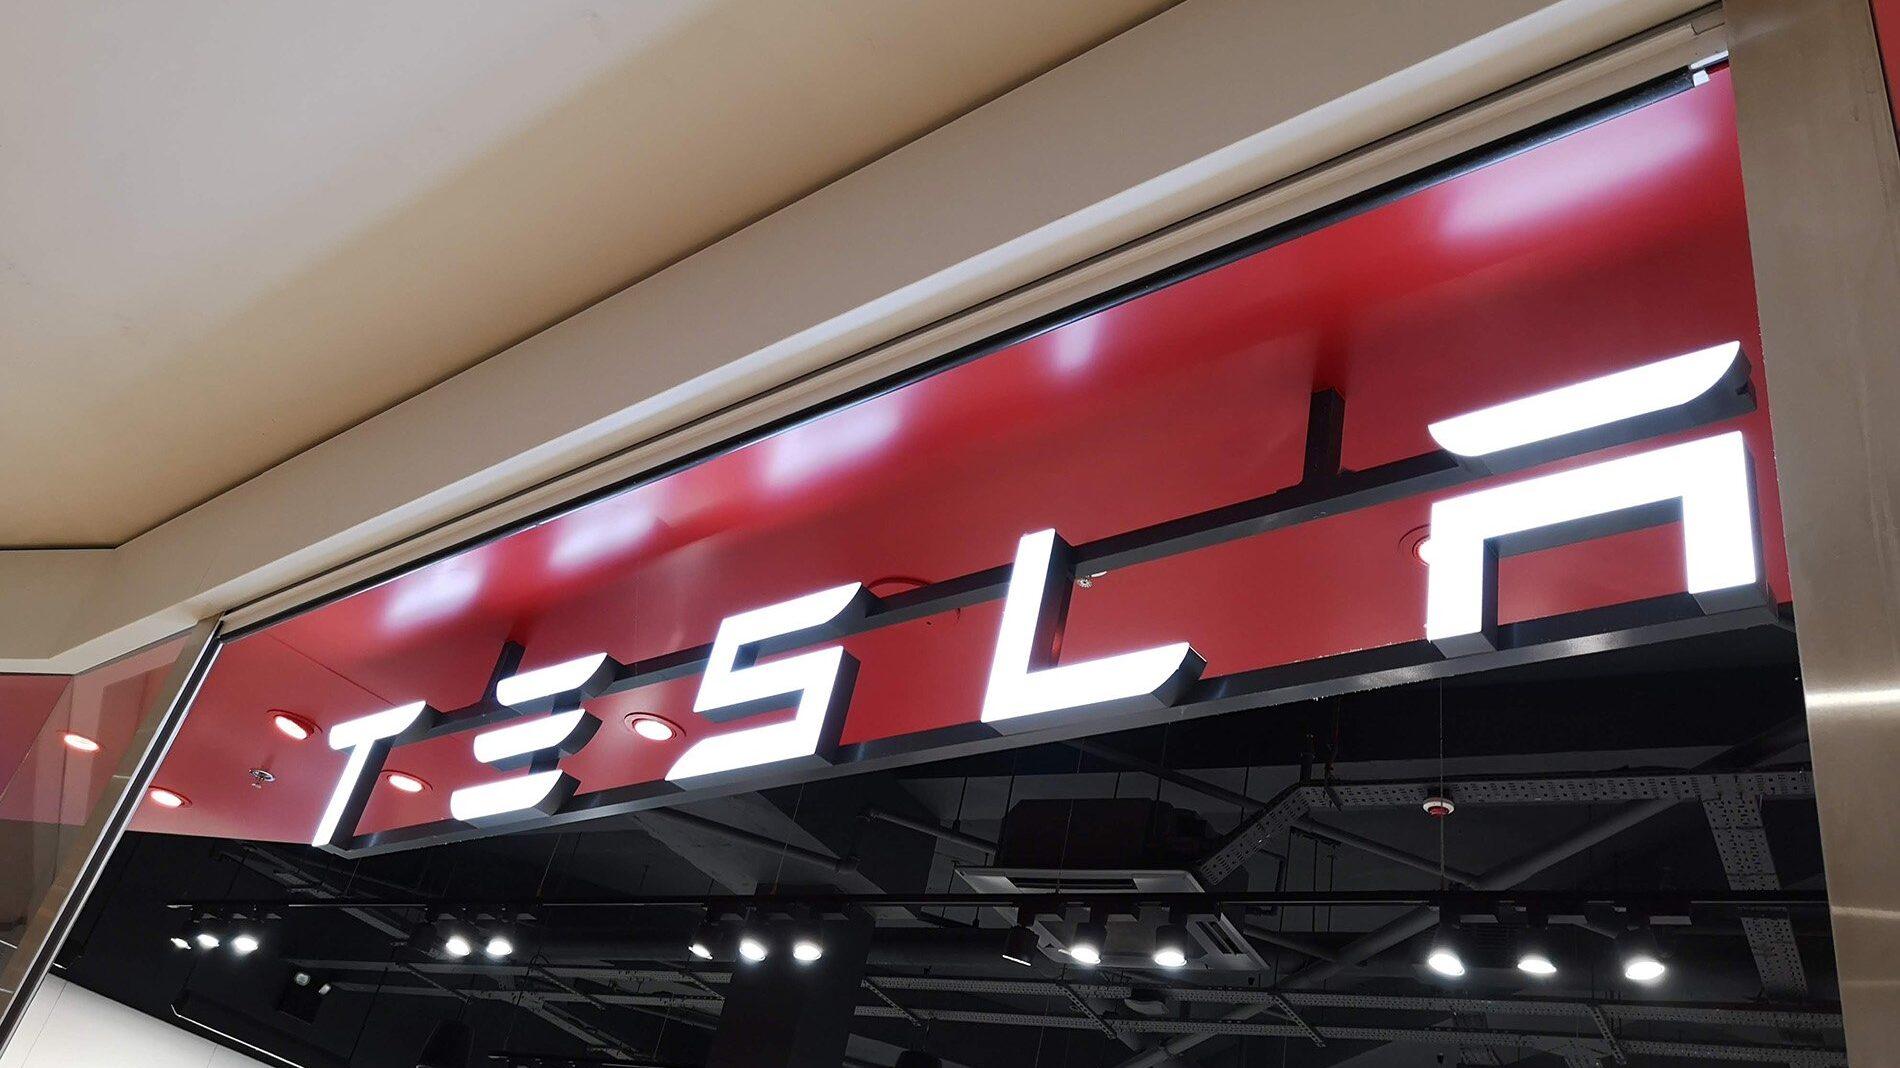 Tesla store front with illuminated logo and neat finishings